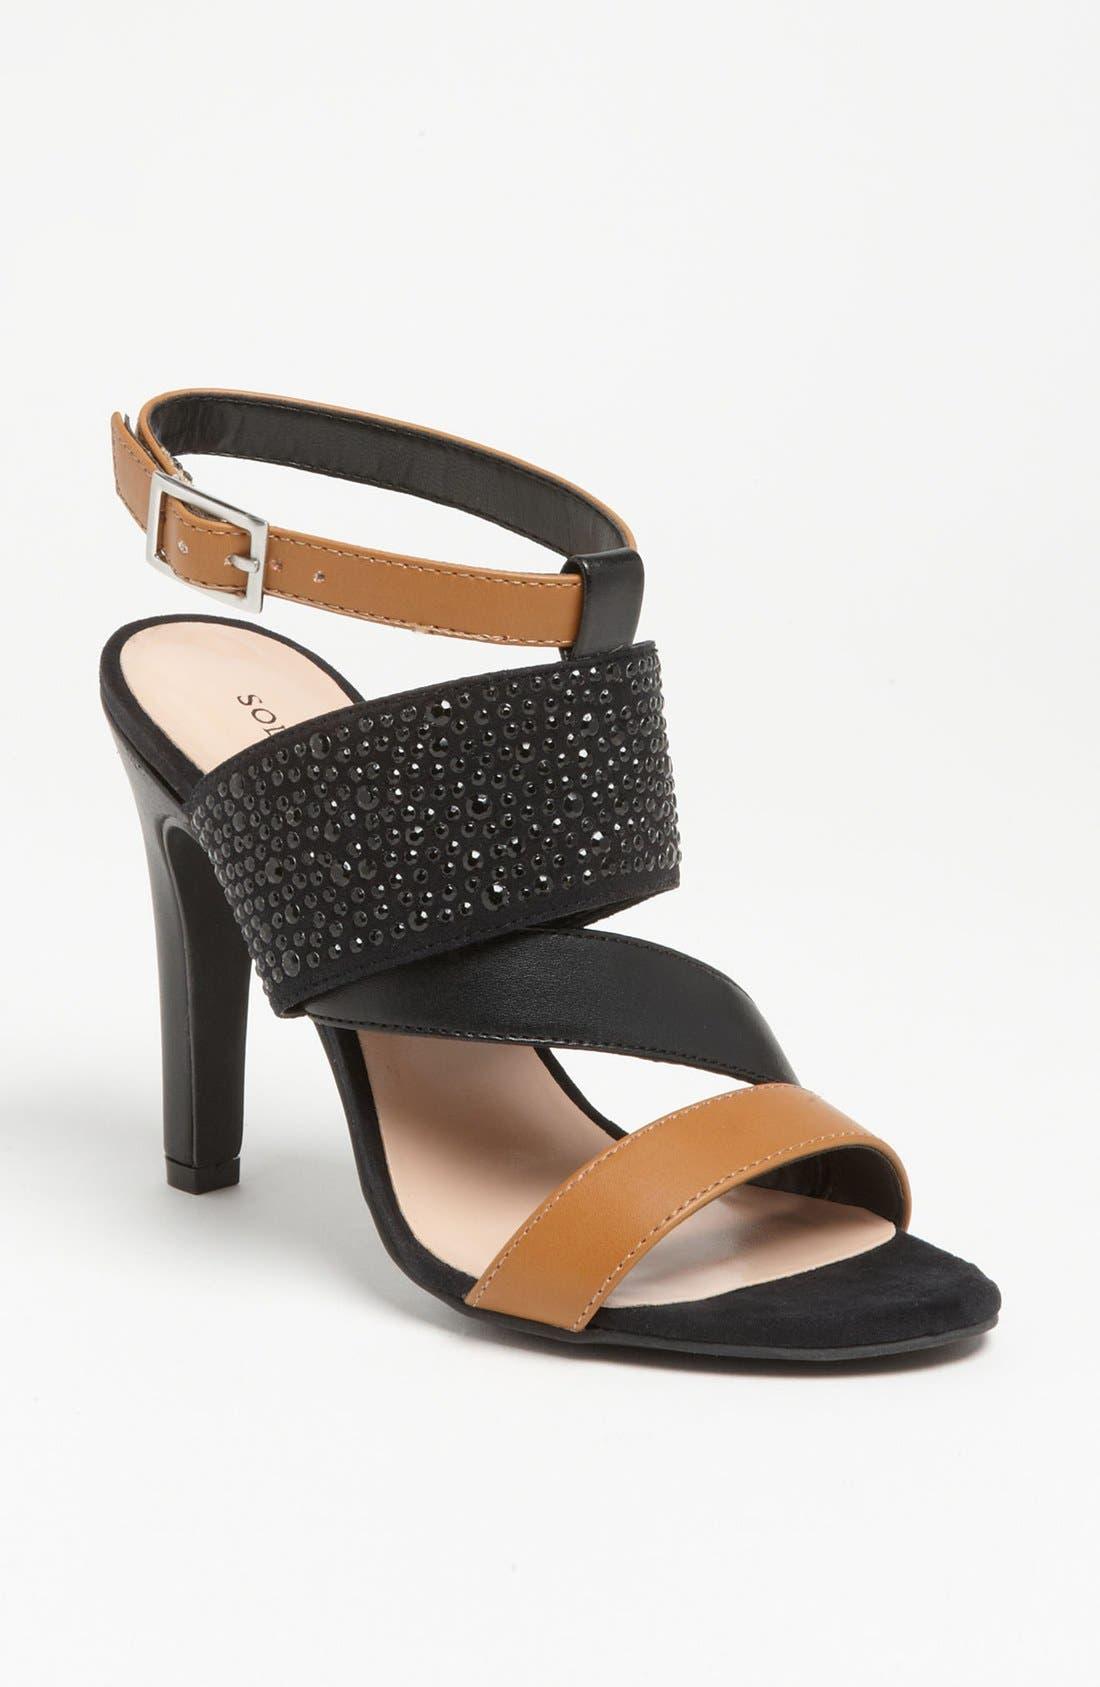 SOLE SOCIETY 'Savannah' Sandal, Main, color, 210